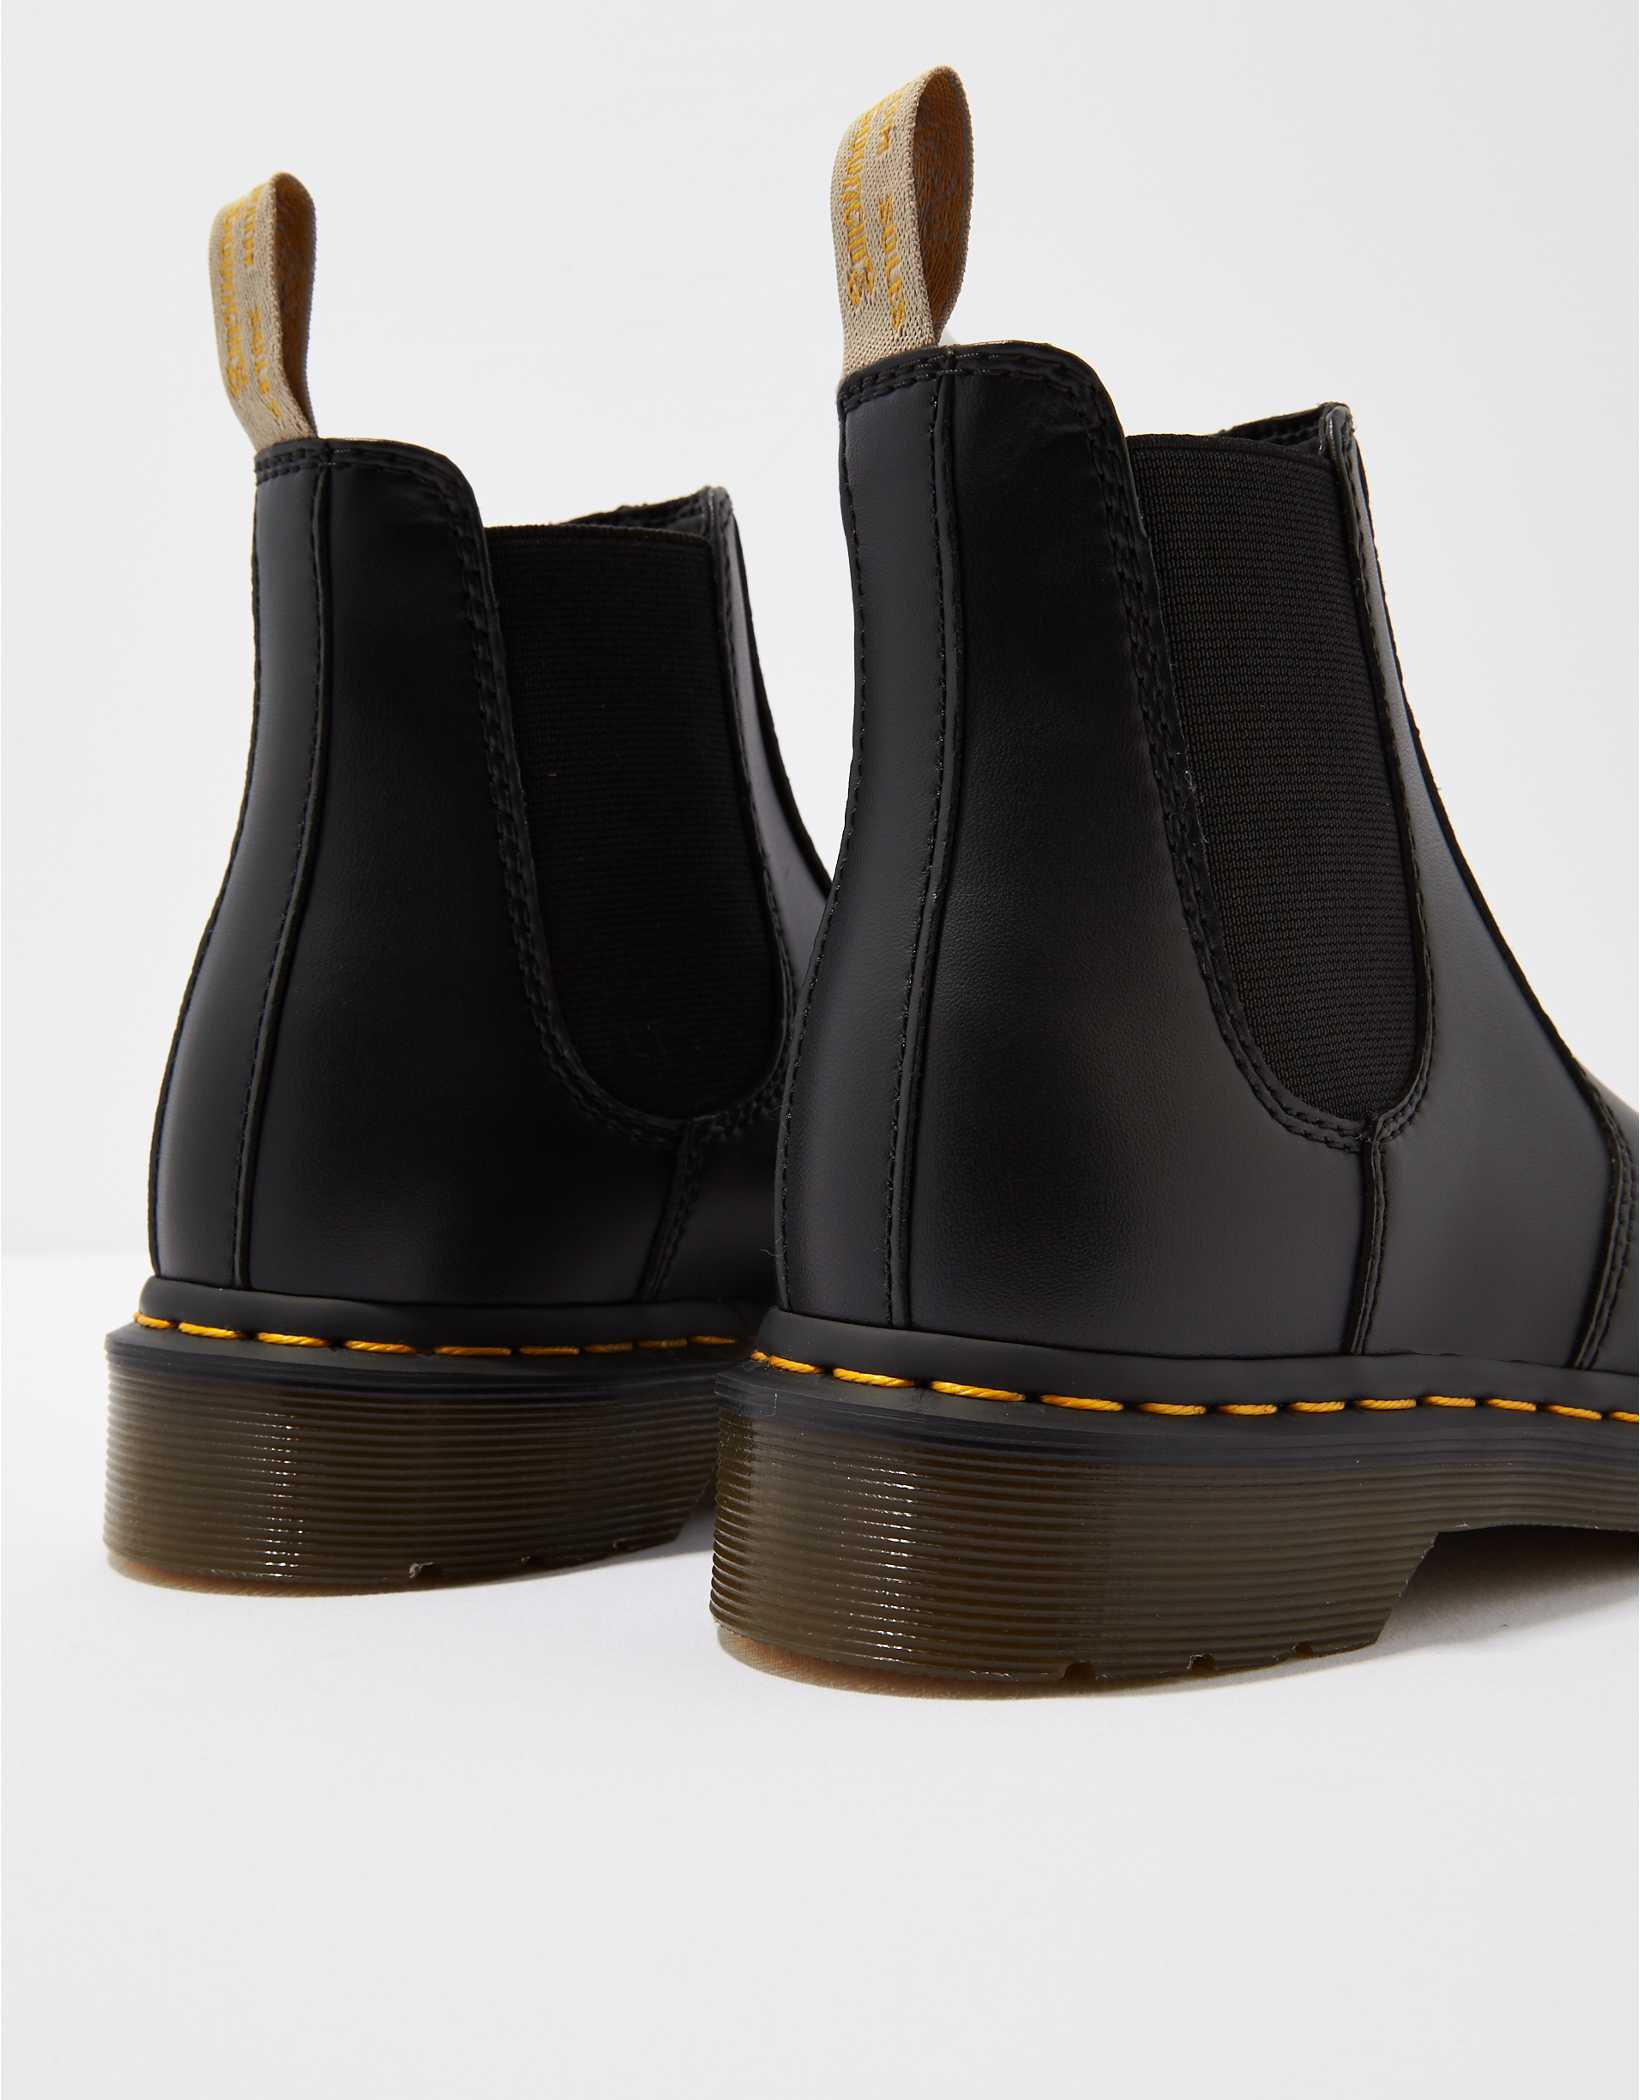 Dr. Martens 2976 Vegan Chelsea Boot